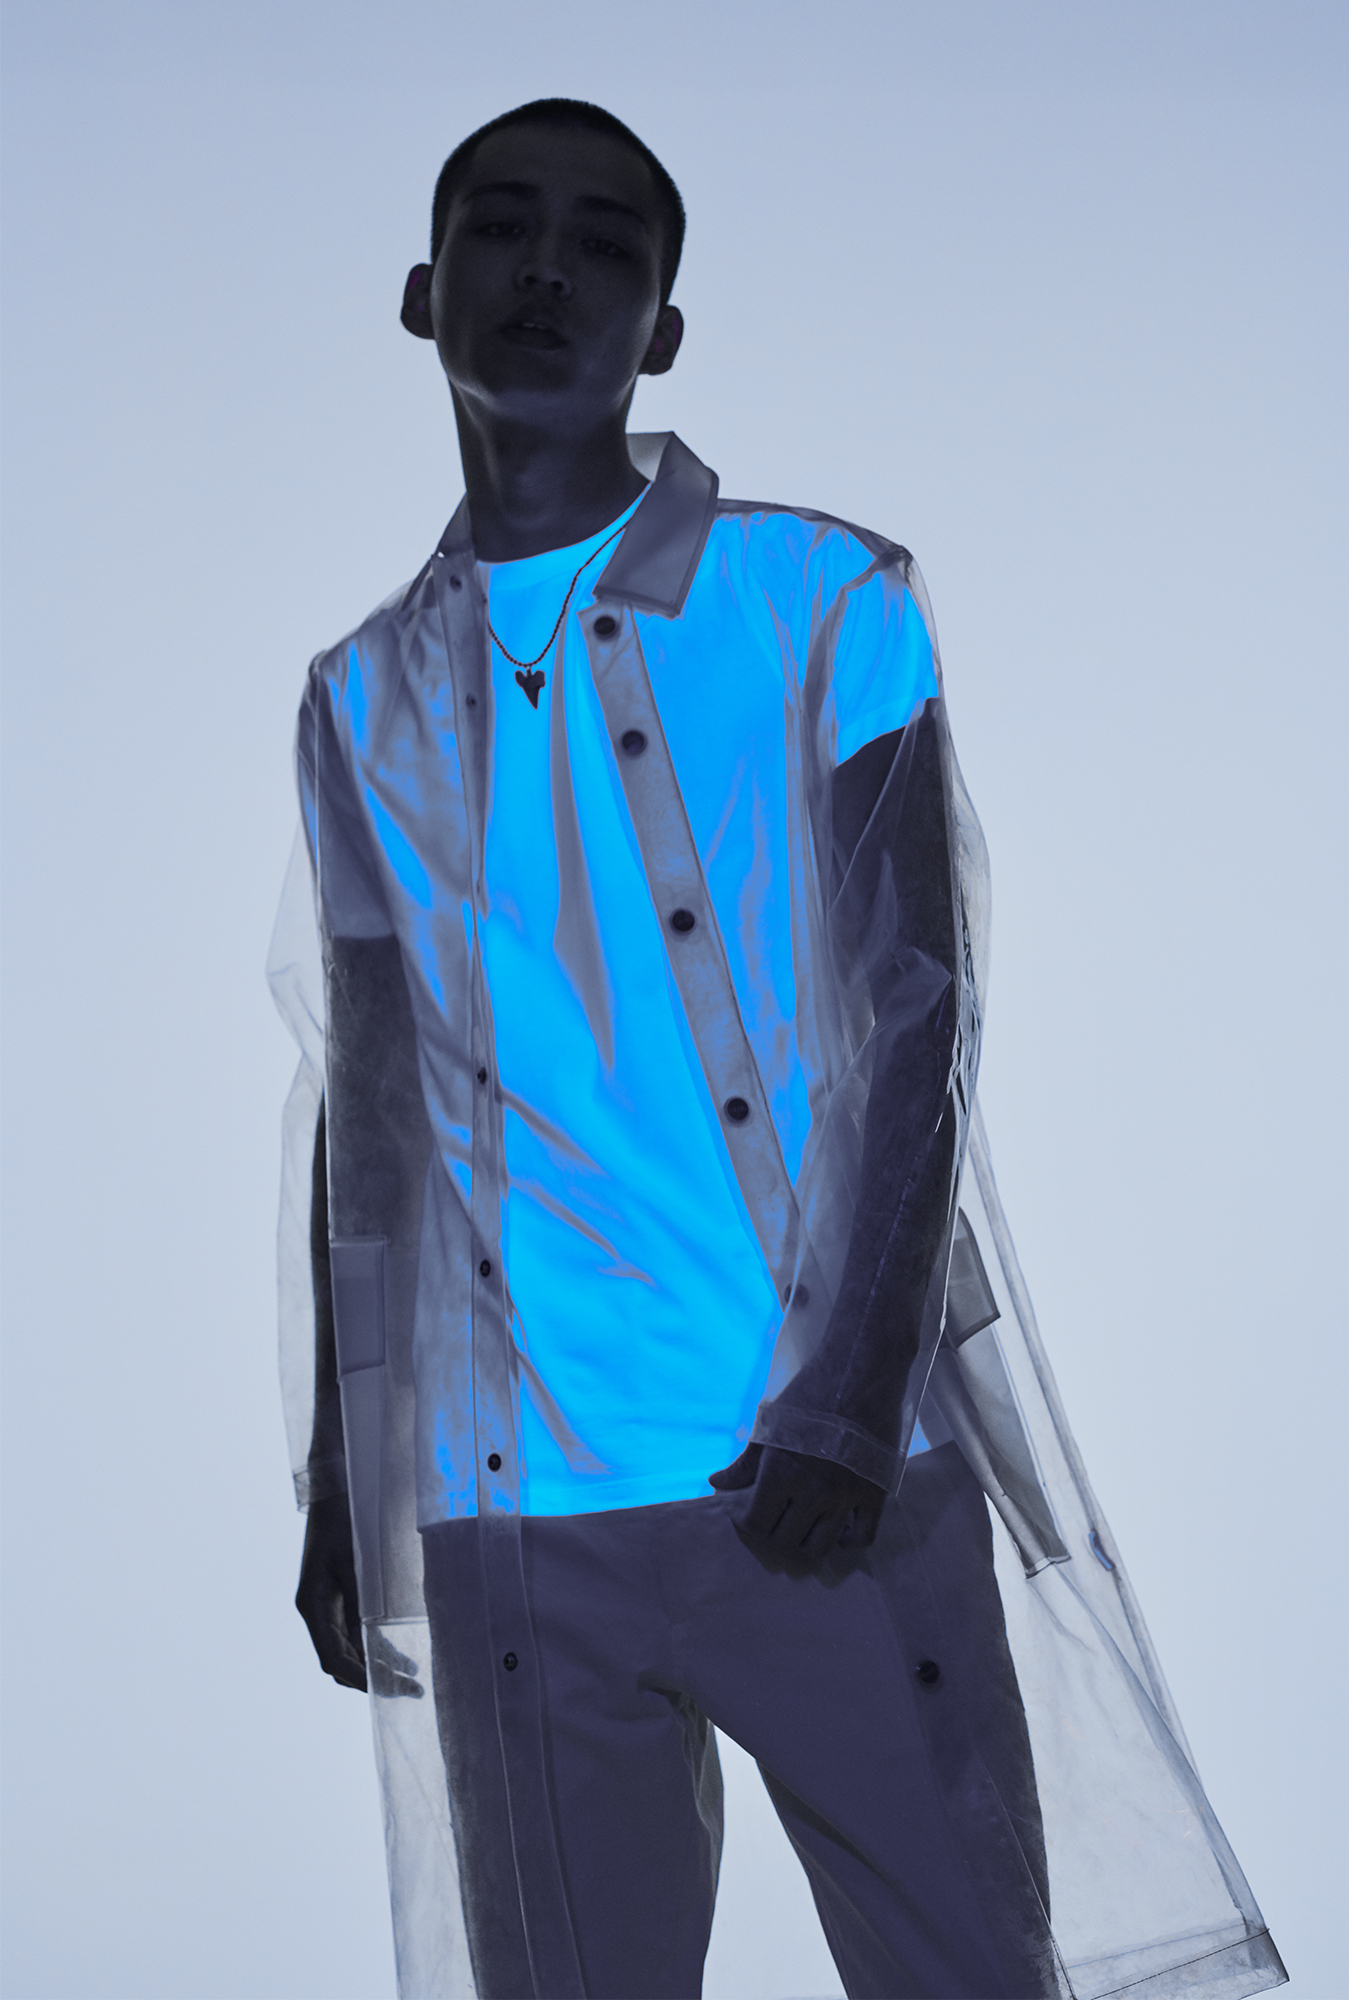 1. Jacket - Stylist's Own Trousers - Woolrich Sunglasses - Ace & Tate x CMMN SWDN 2. Coat - Rains T-shirt - Neil Barrett (Mr Porter) Trousers - Margaret Howell